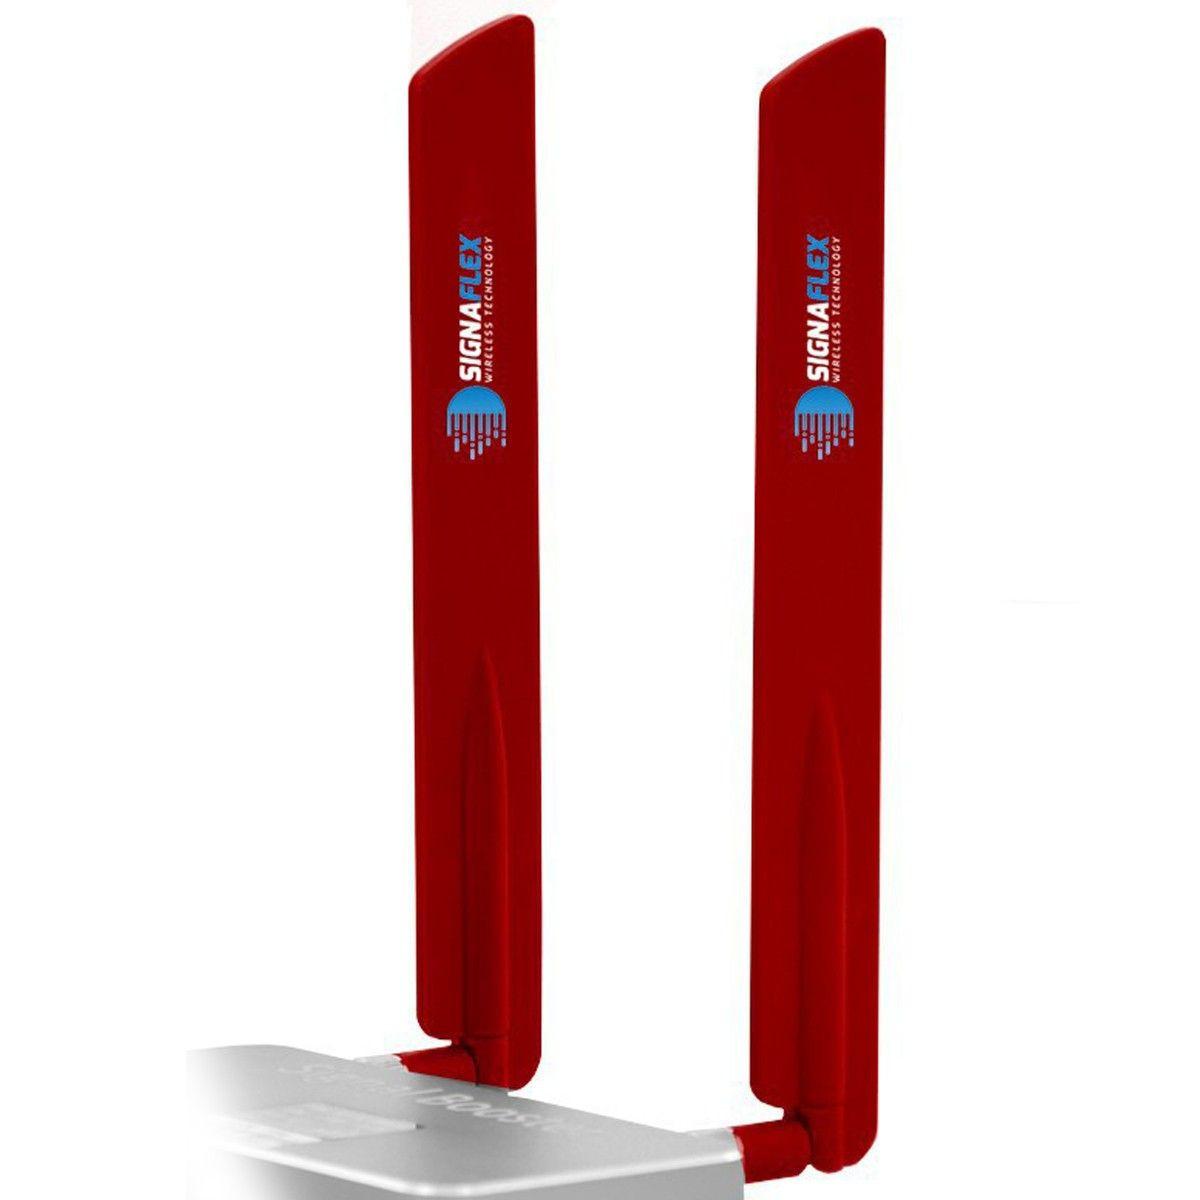 Antena bat 4G LTE red 15dbi SMA -2 szt